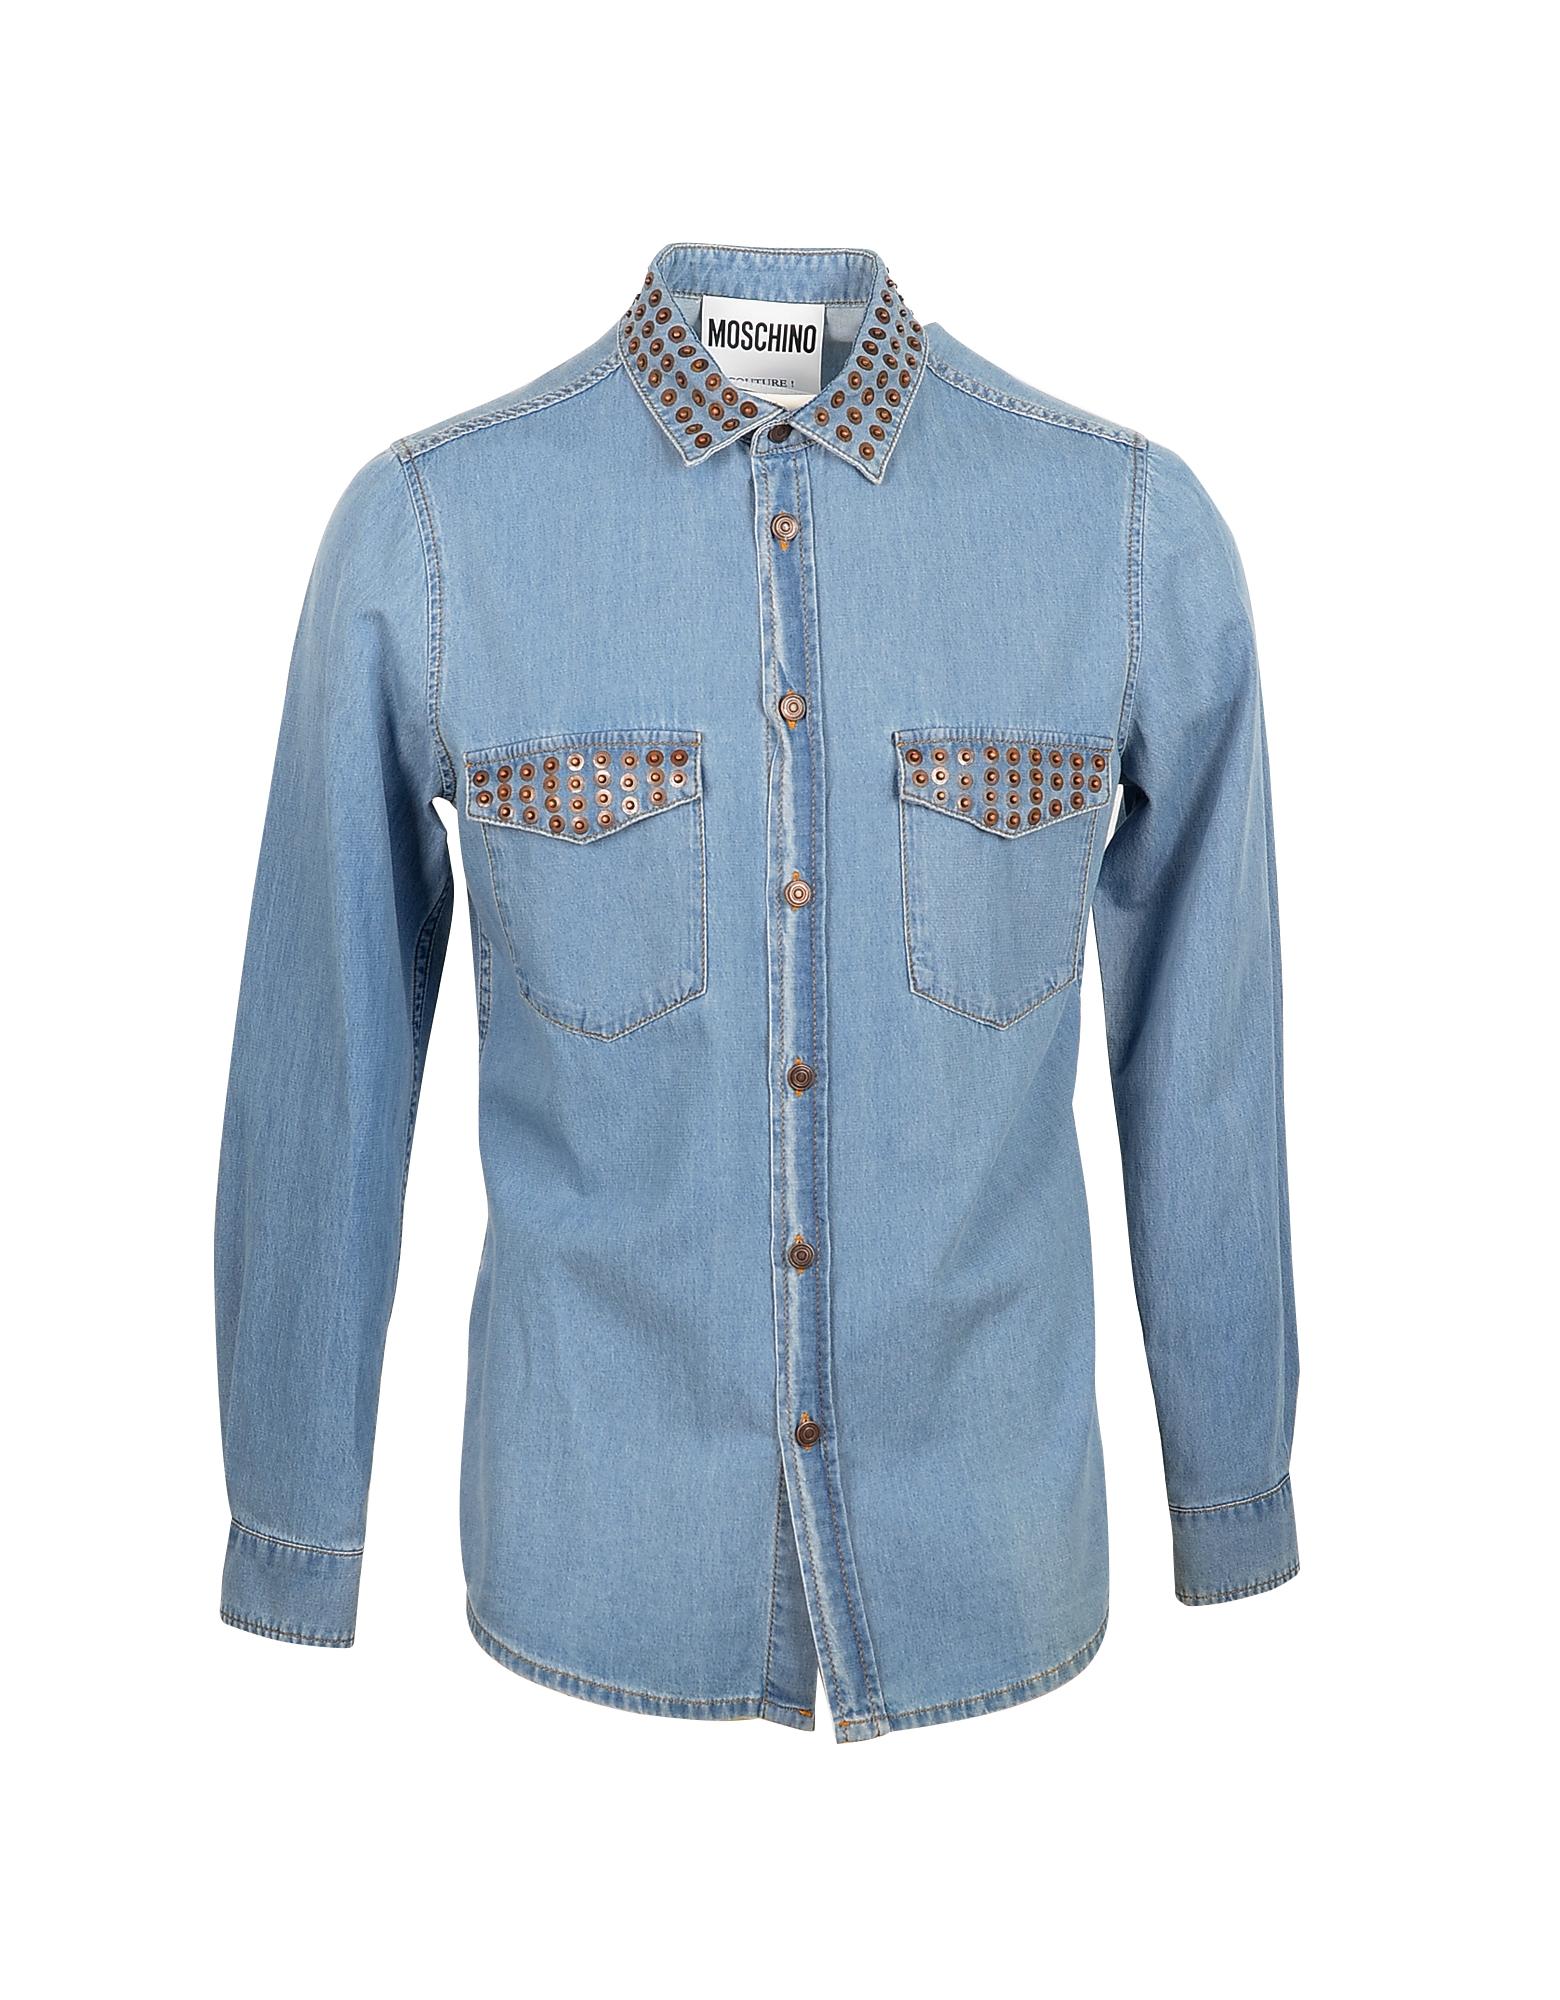 Moschino Designer Shirts, Blue Denim Men's Shirt w/Studs